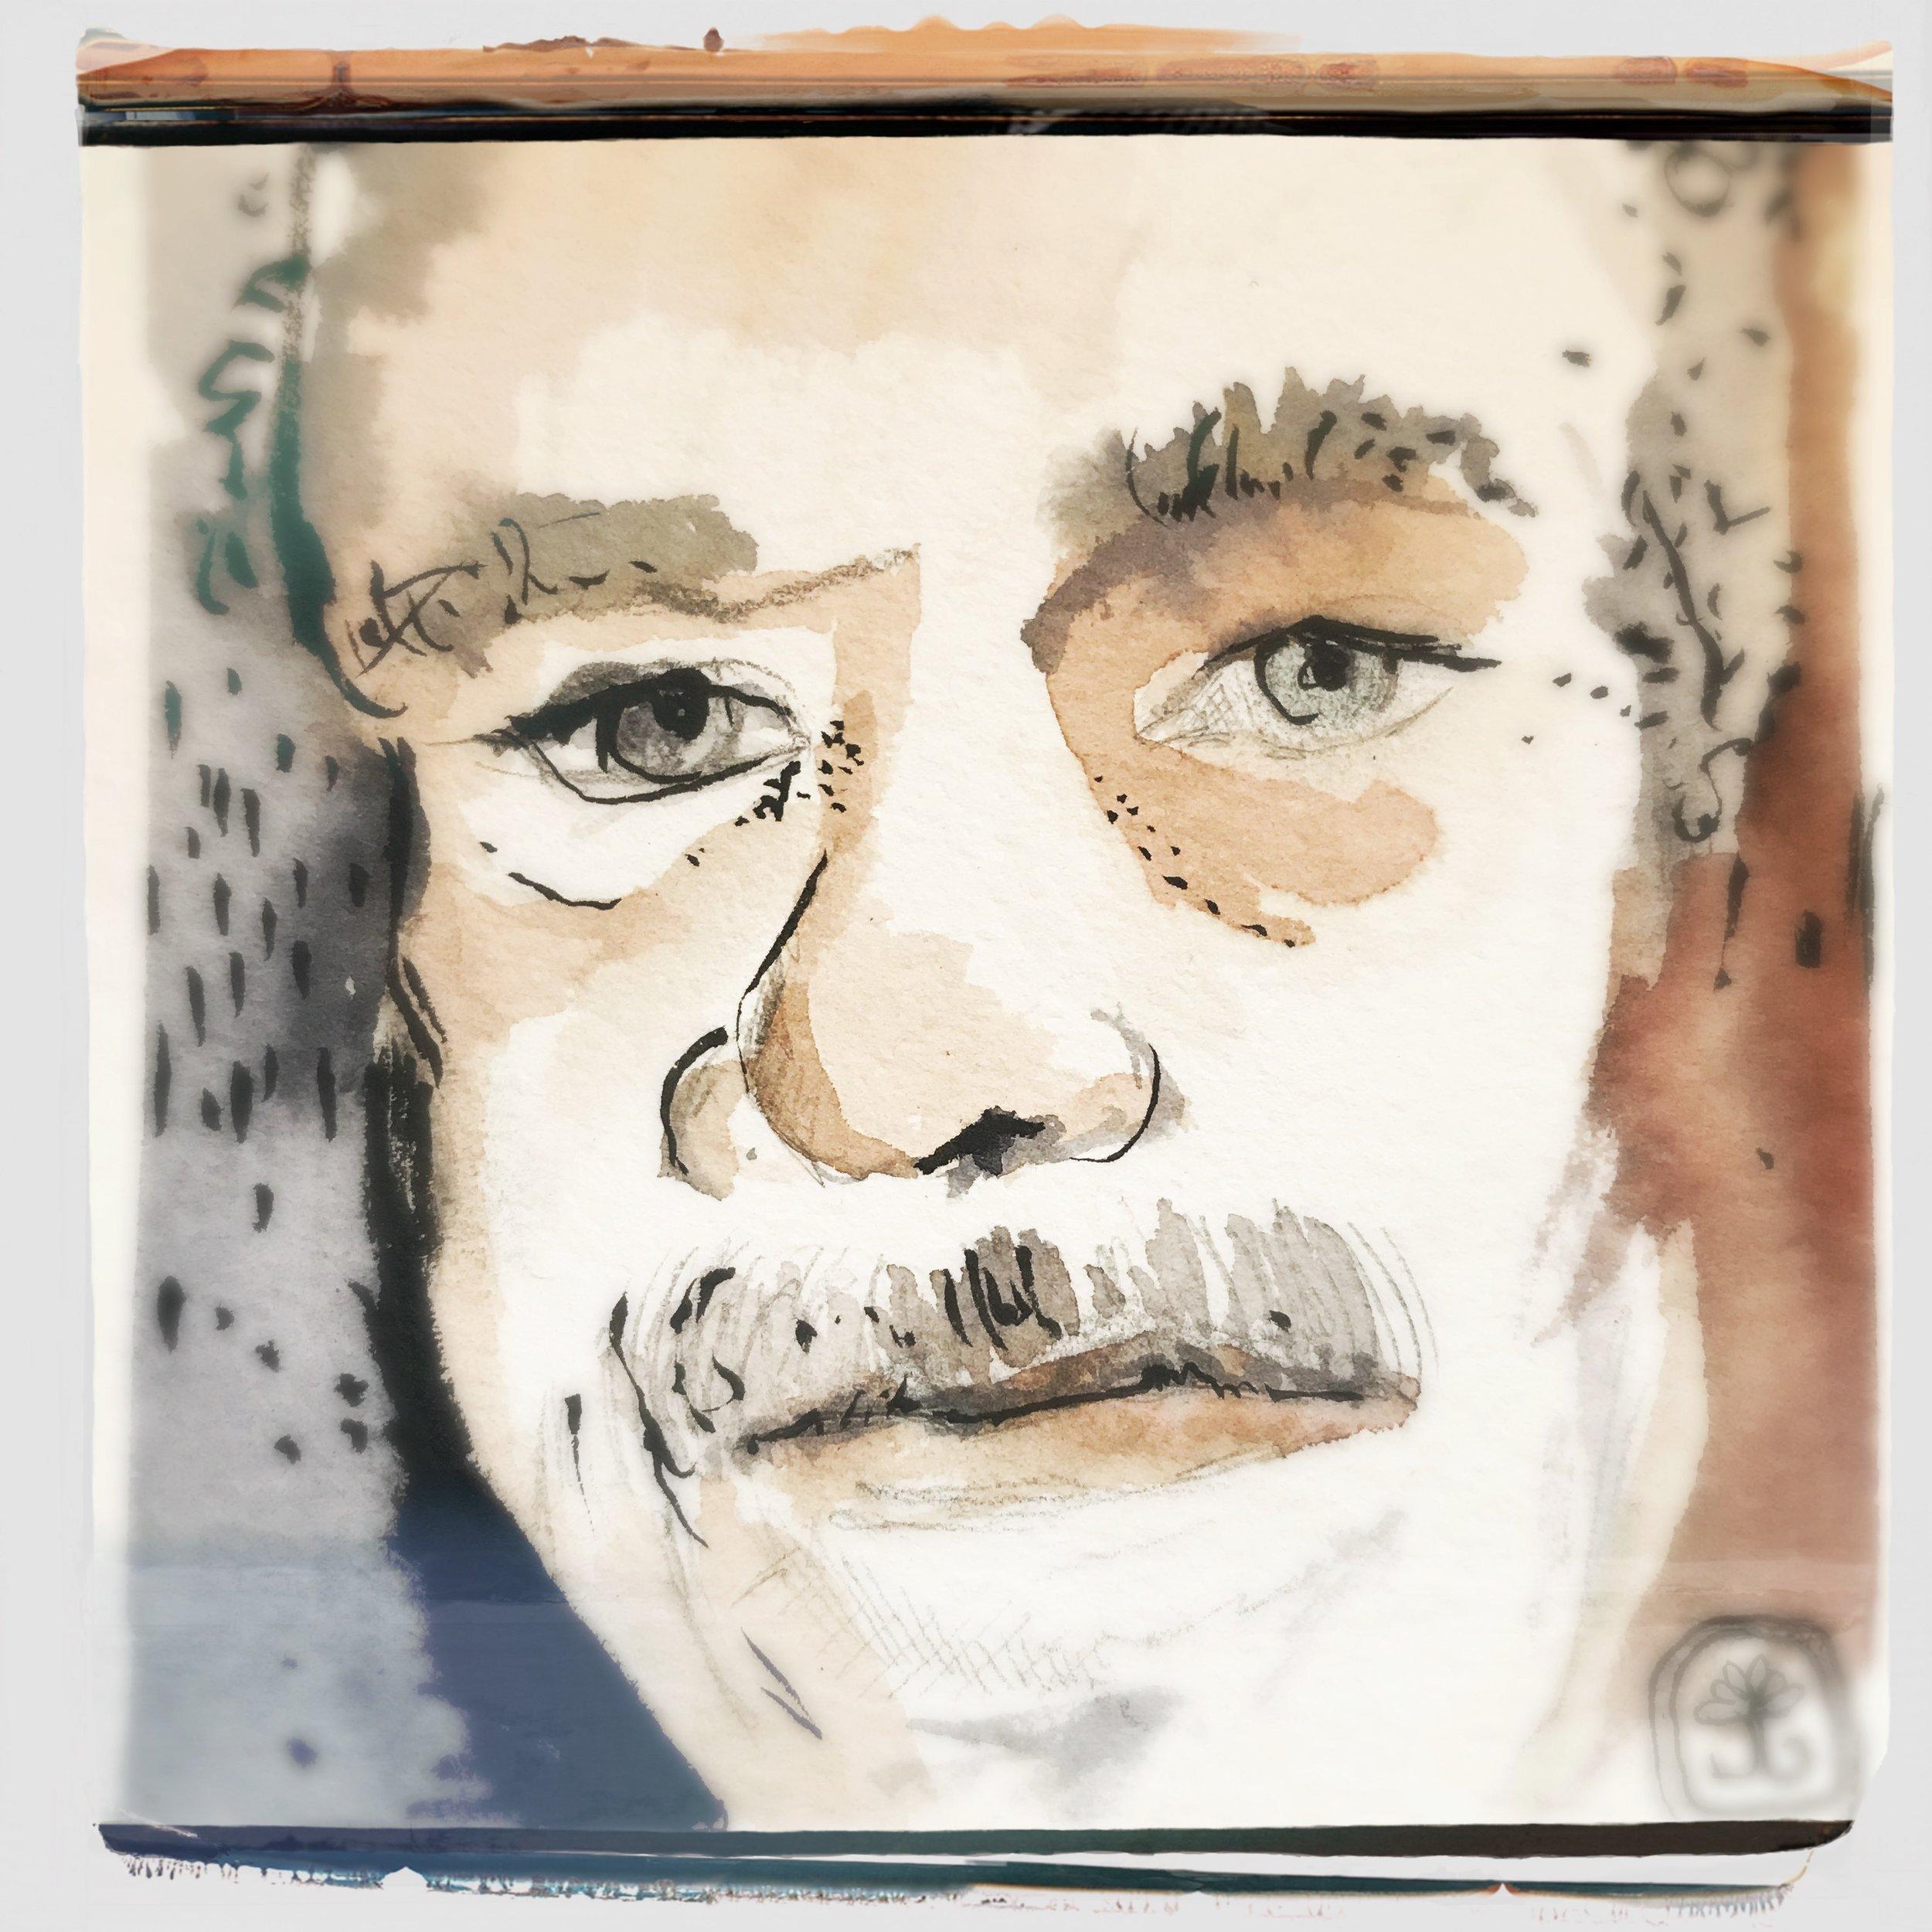 Poet, Derek Walcott